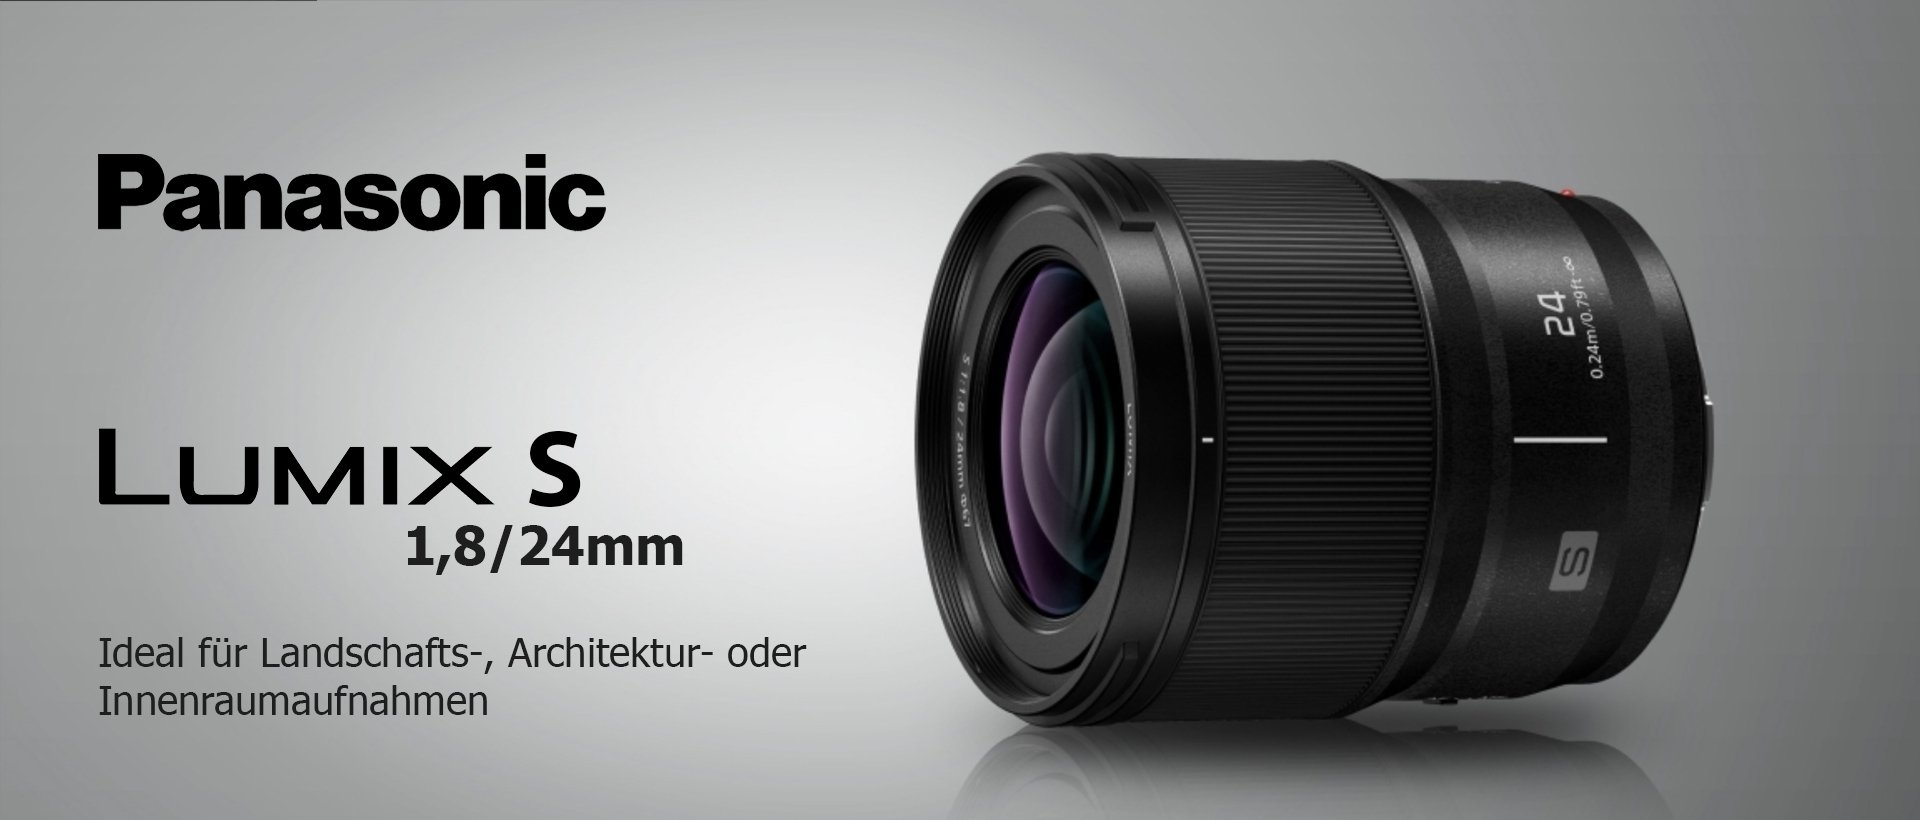 Panasonic Lumix S 1,8/24mm